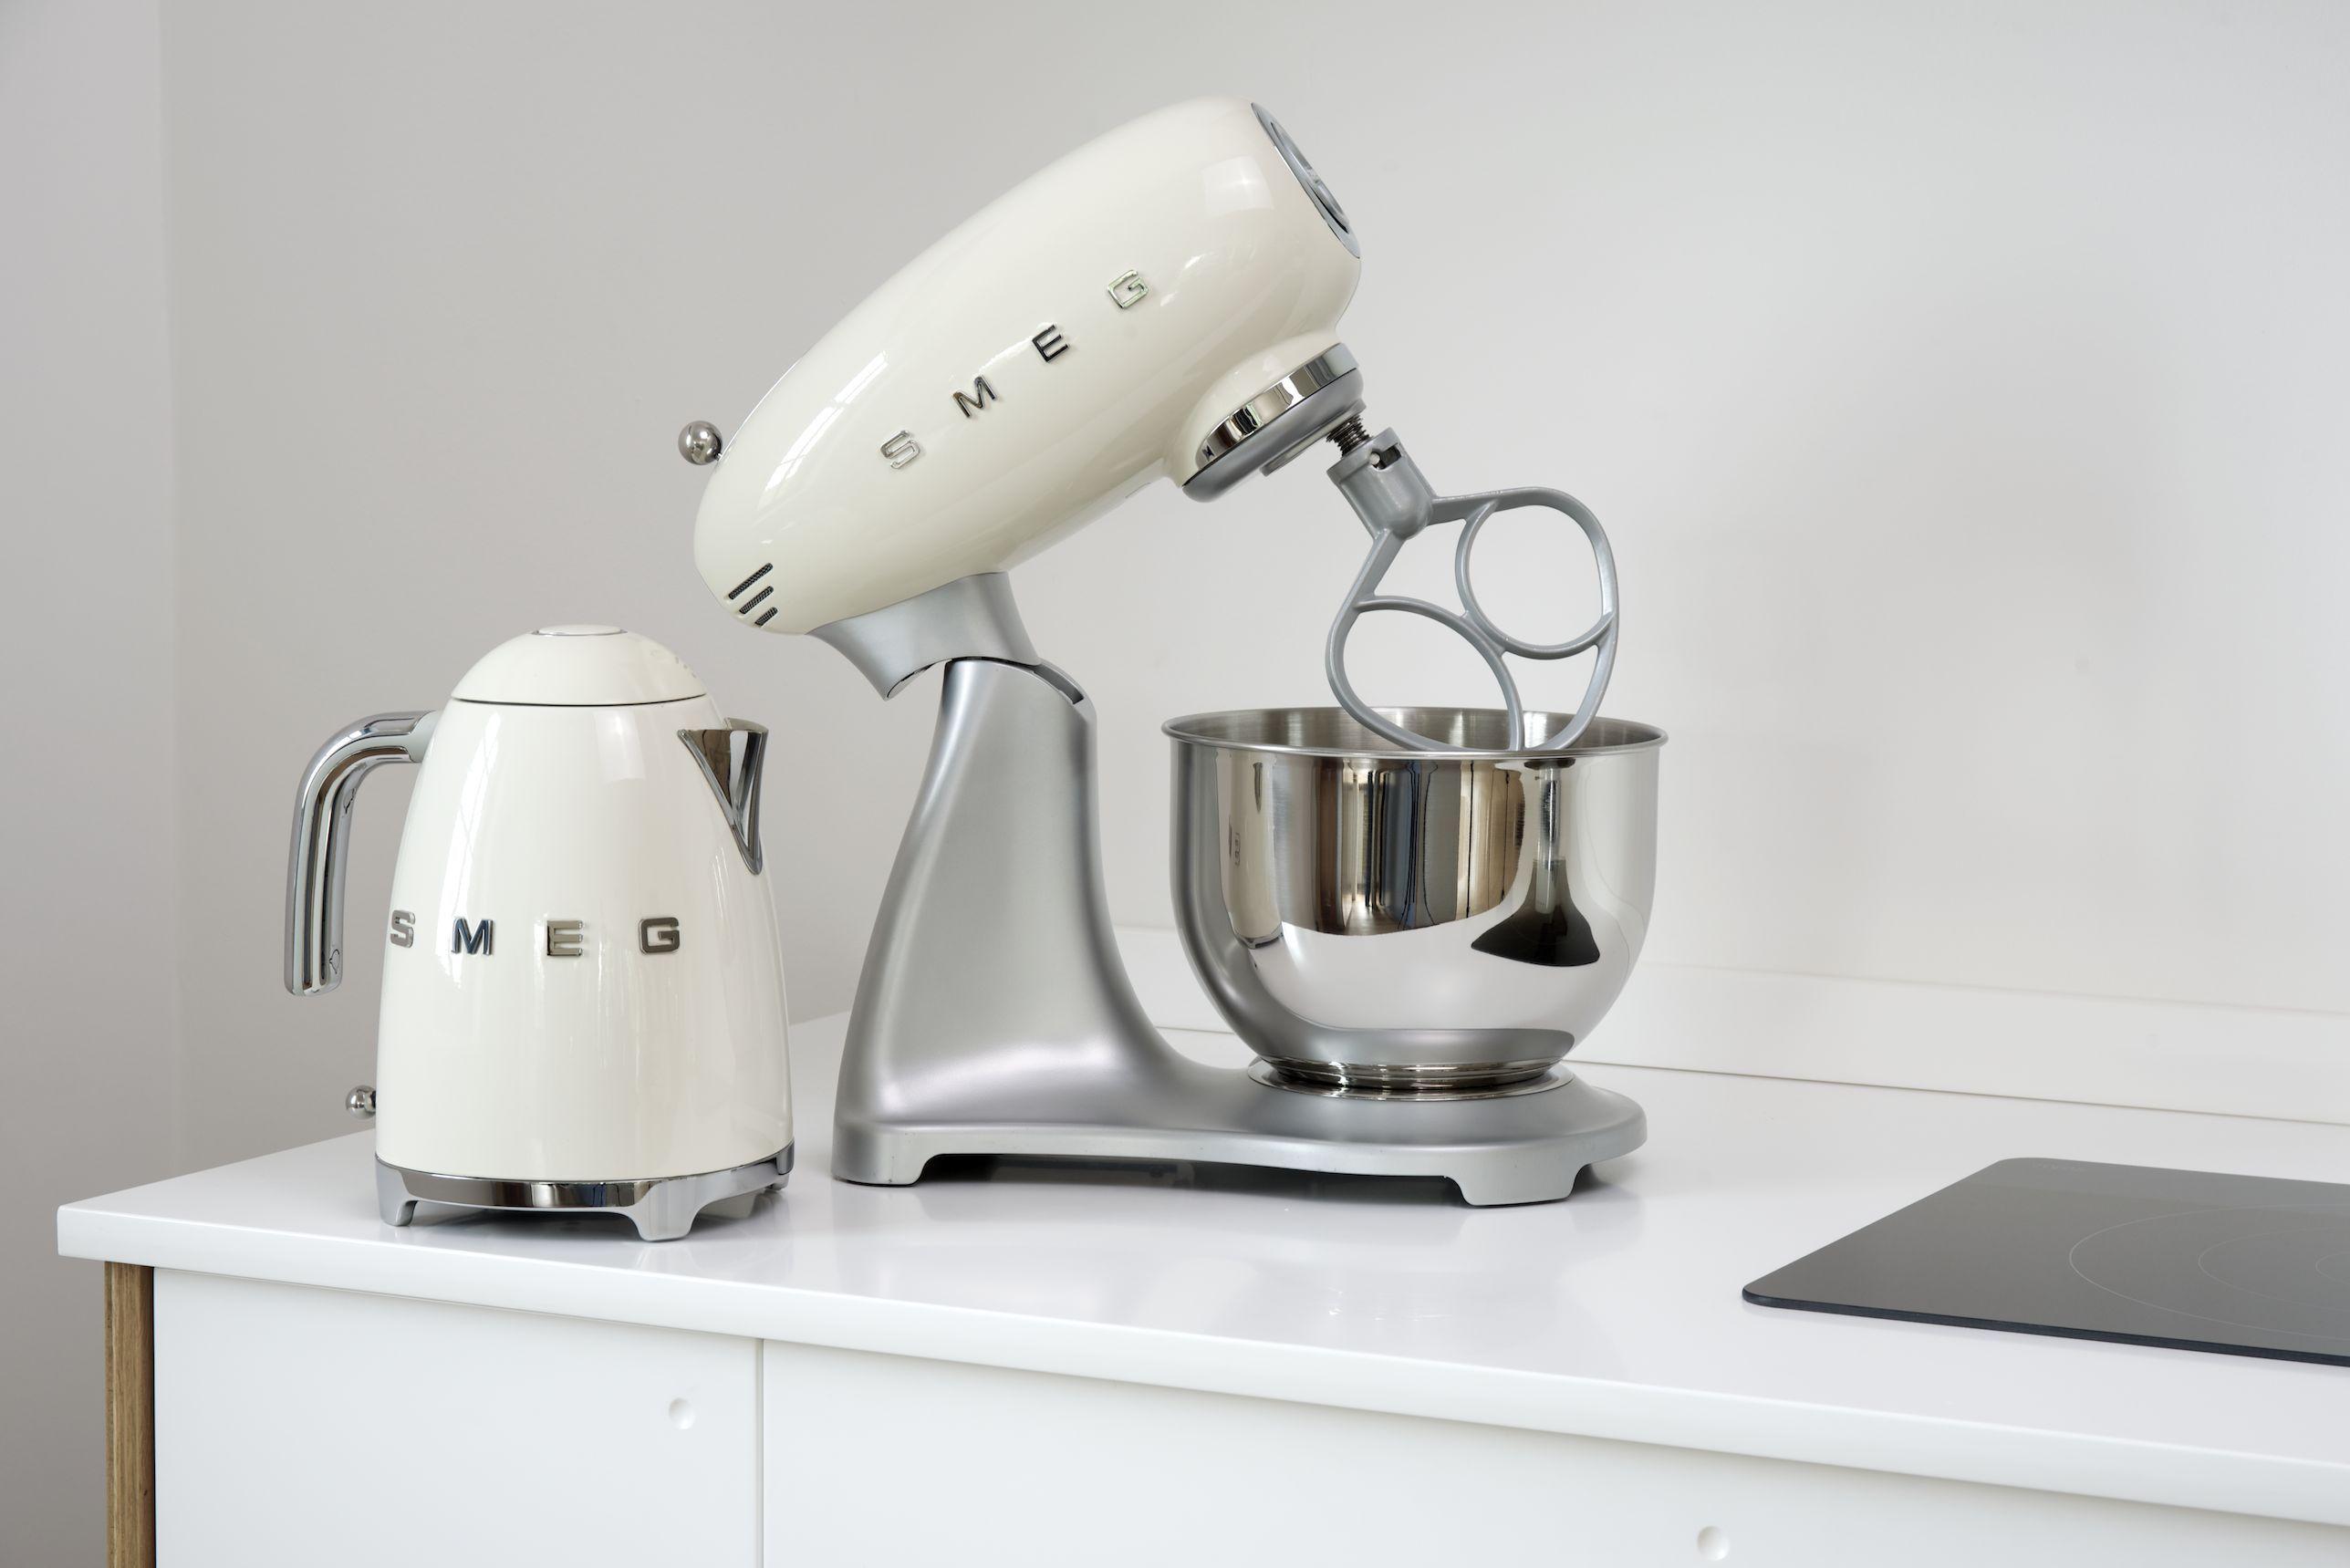 John Lewis Kitchen Appliances Photoshoot Of Our Air Kitchen With Smegs Lovely New Retro Kettles